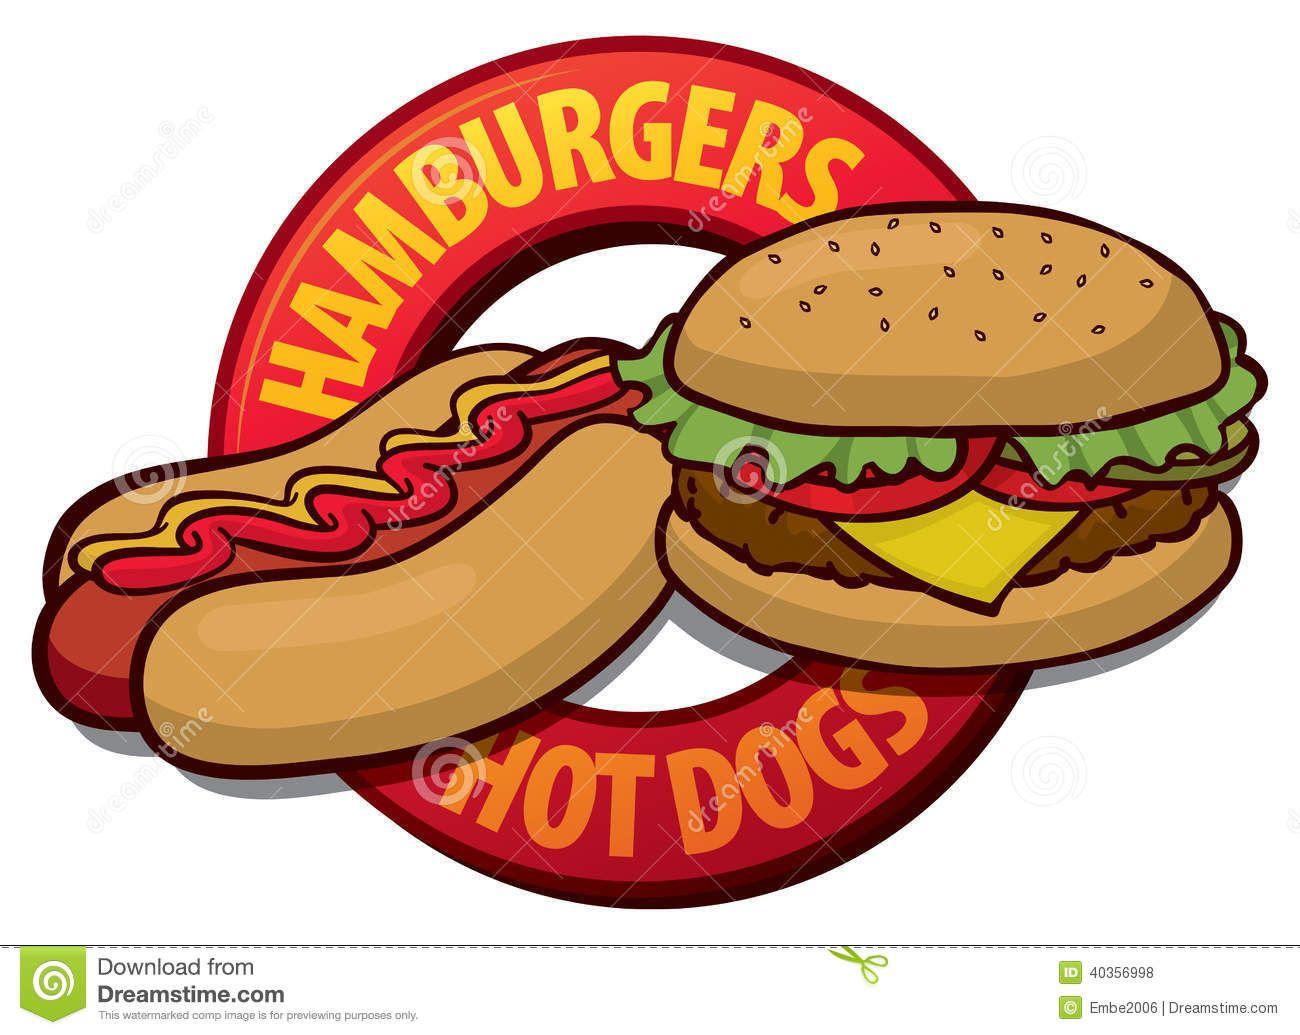 Hamburger silhouette at getdrawings. Chips clipart hot dog